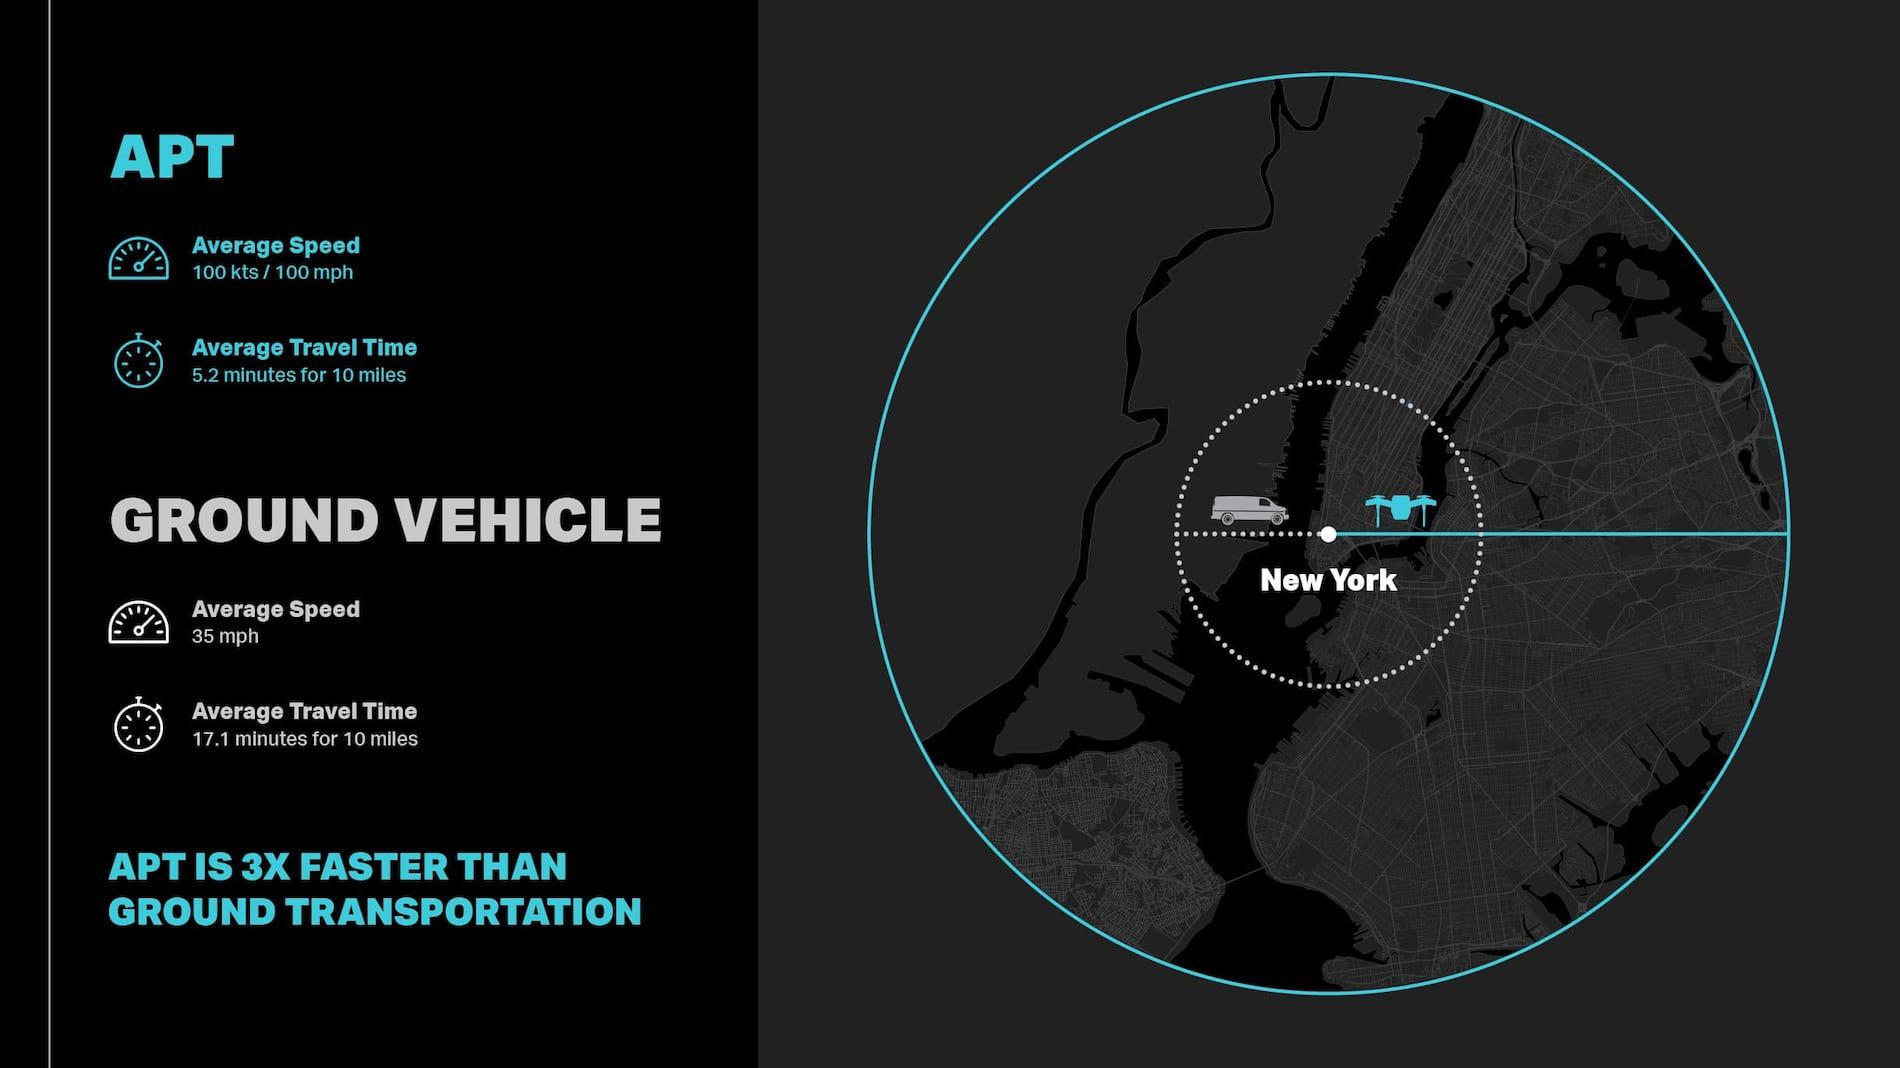 Mapa de alcance de Bell APT